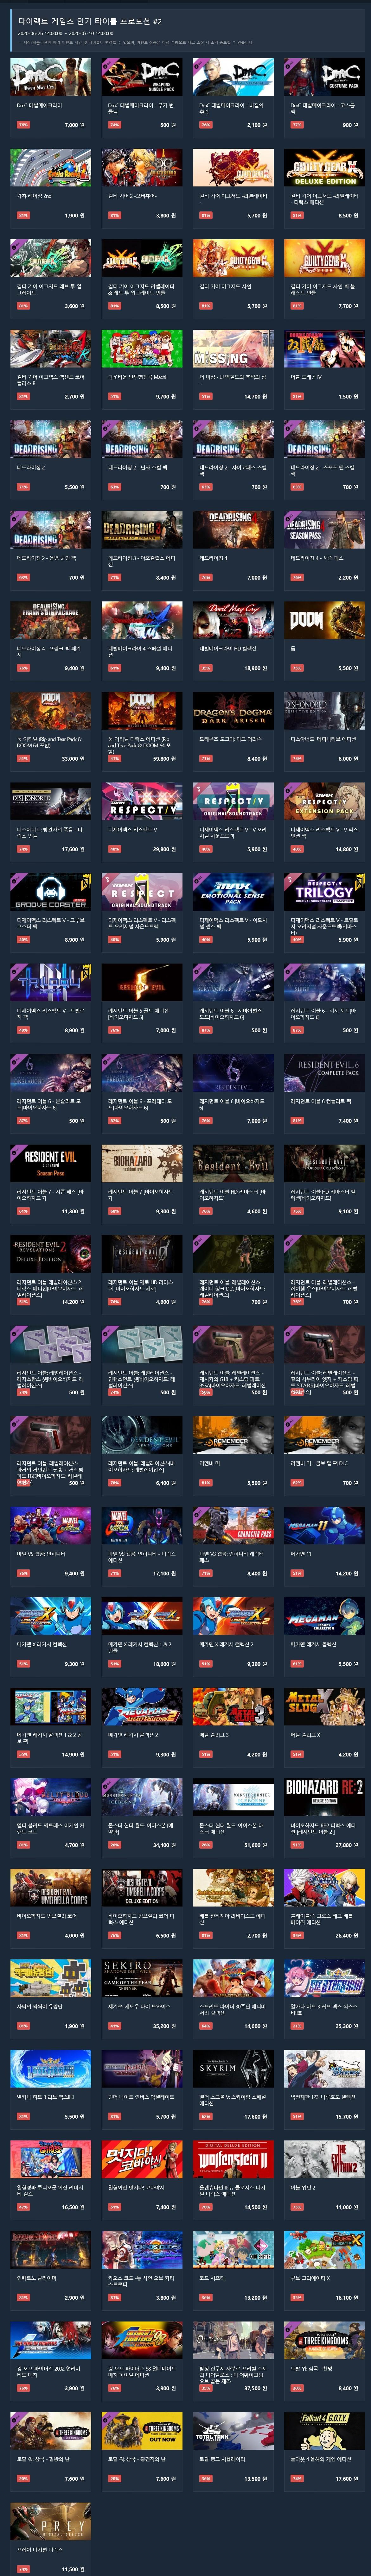 Screenshot_2020-06-29 다이렉트게임즈 다이렉트 게임즈 인기 타이틀 프로모션 #2.jpg